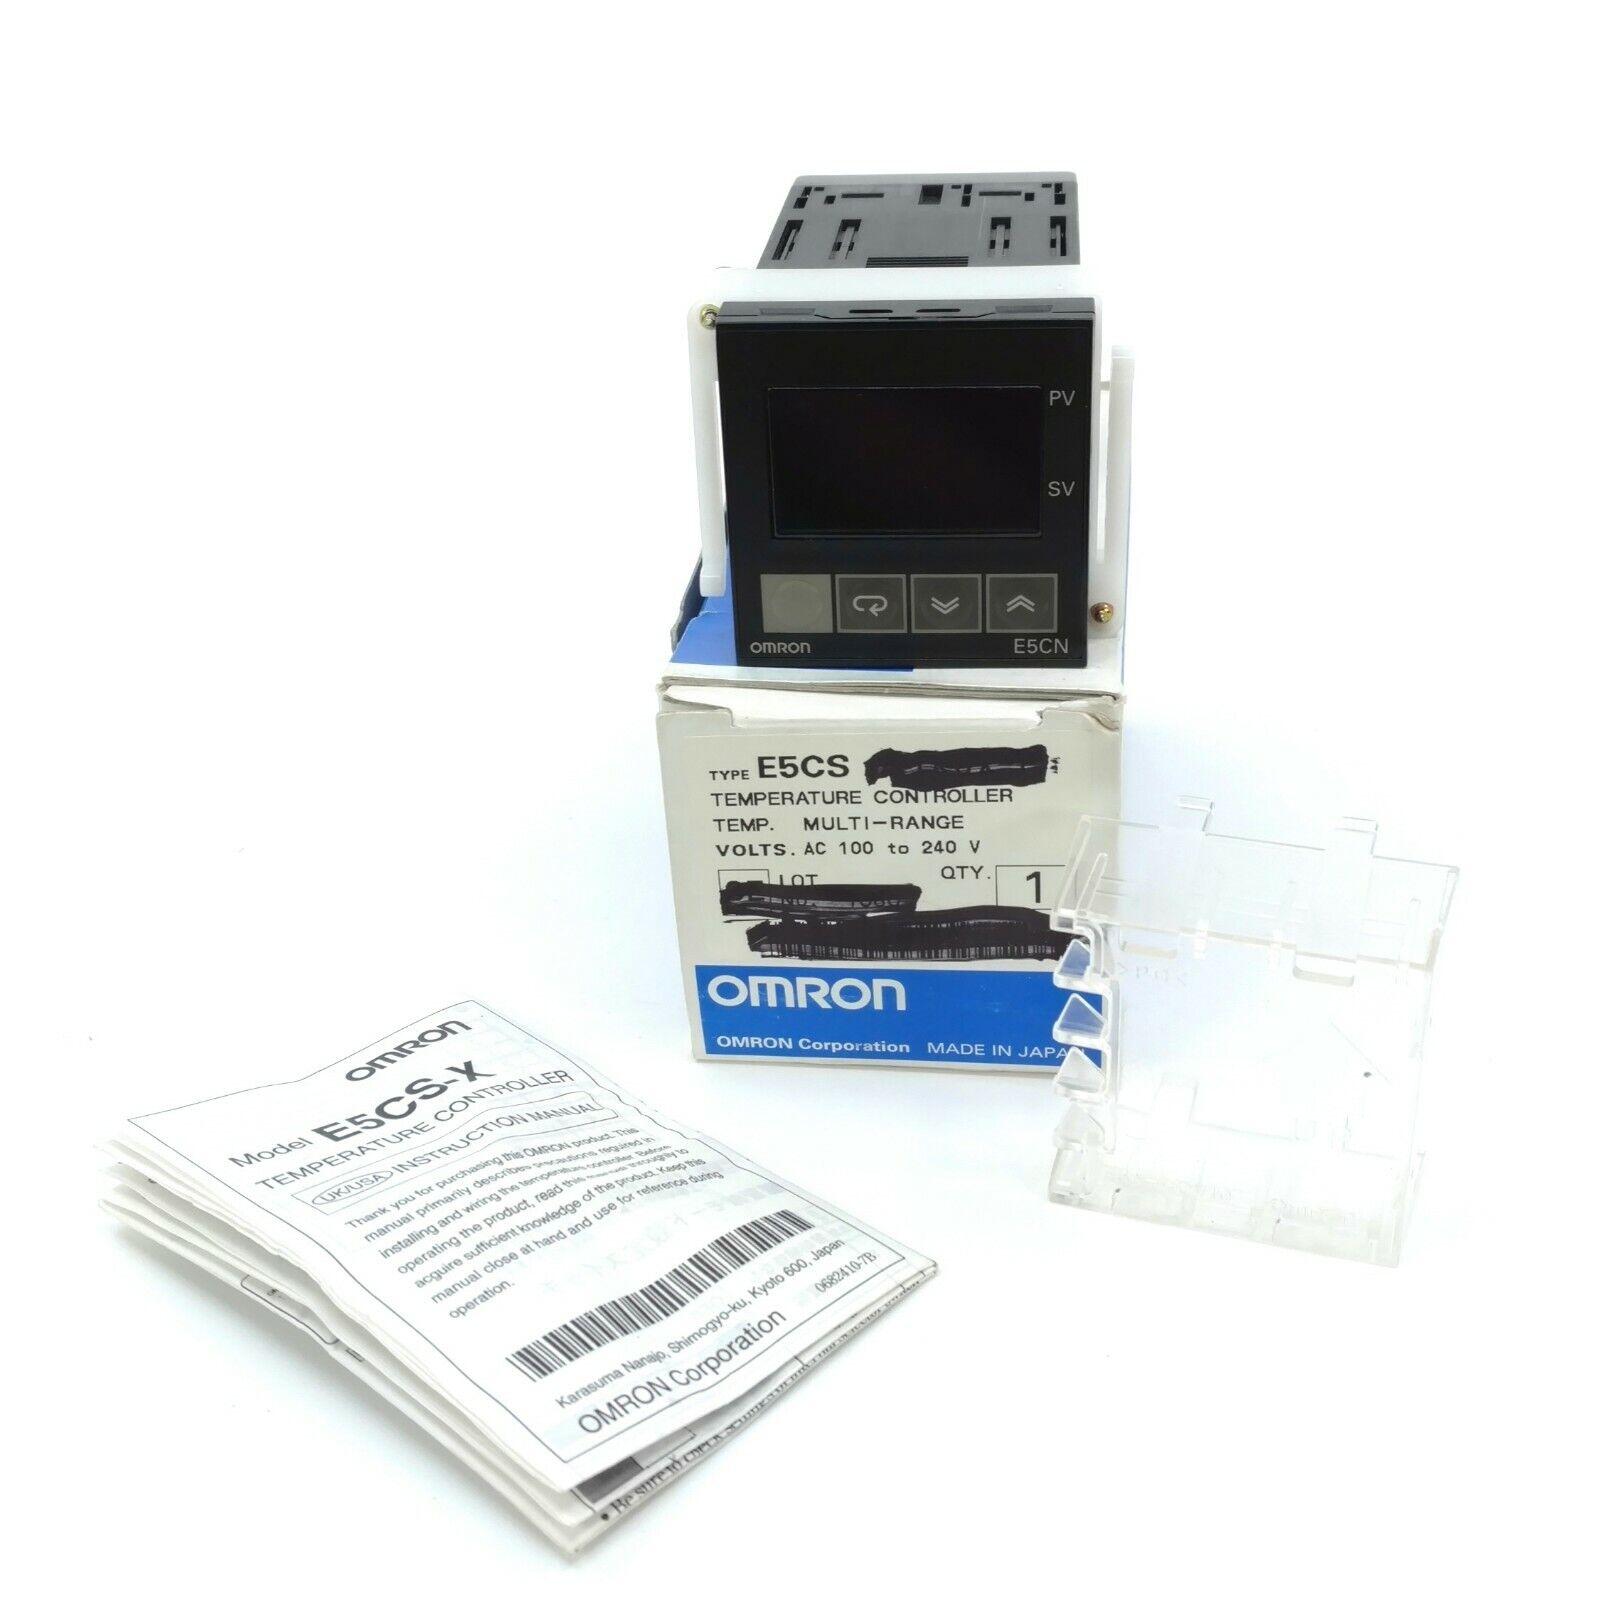 New IN BOX Omron Temperature Controller E5CS-Q1KJX 1 year warranty